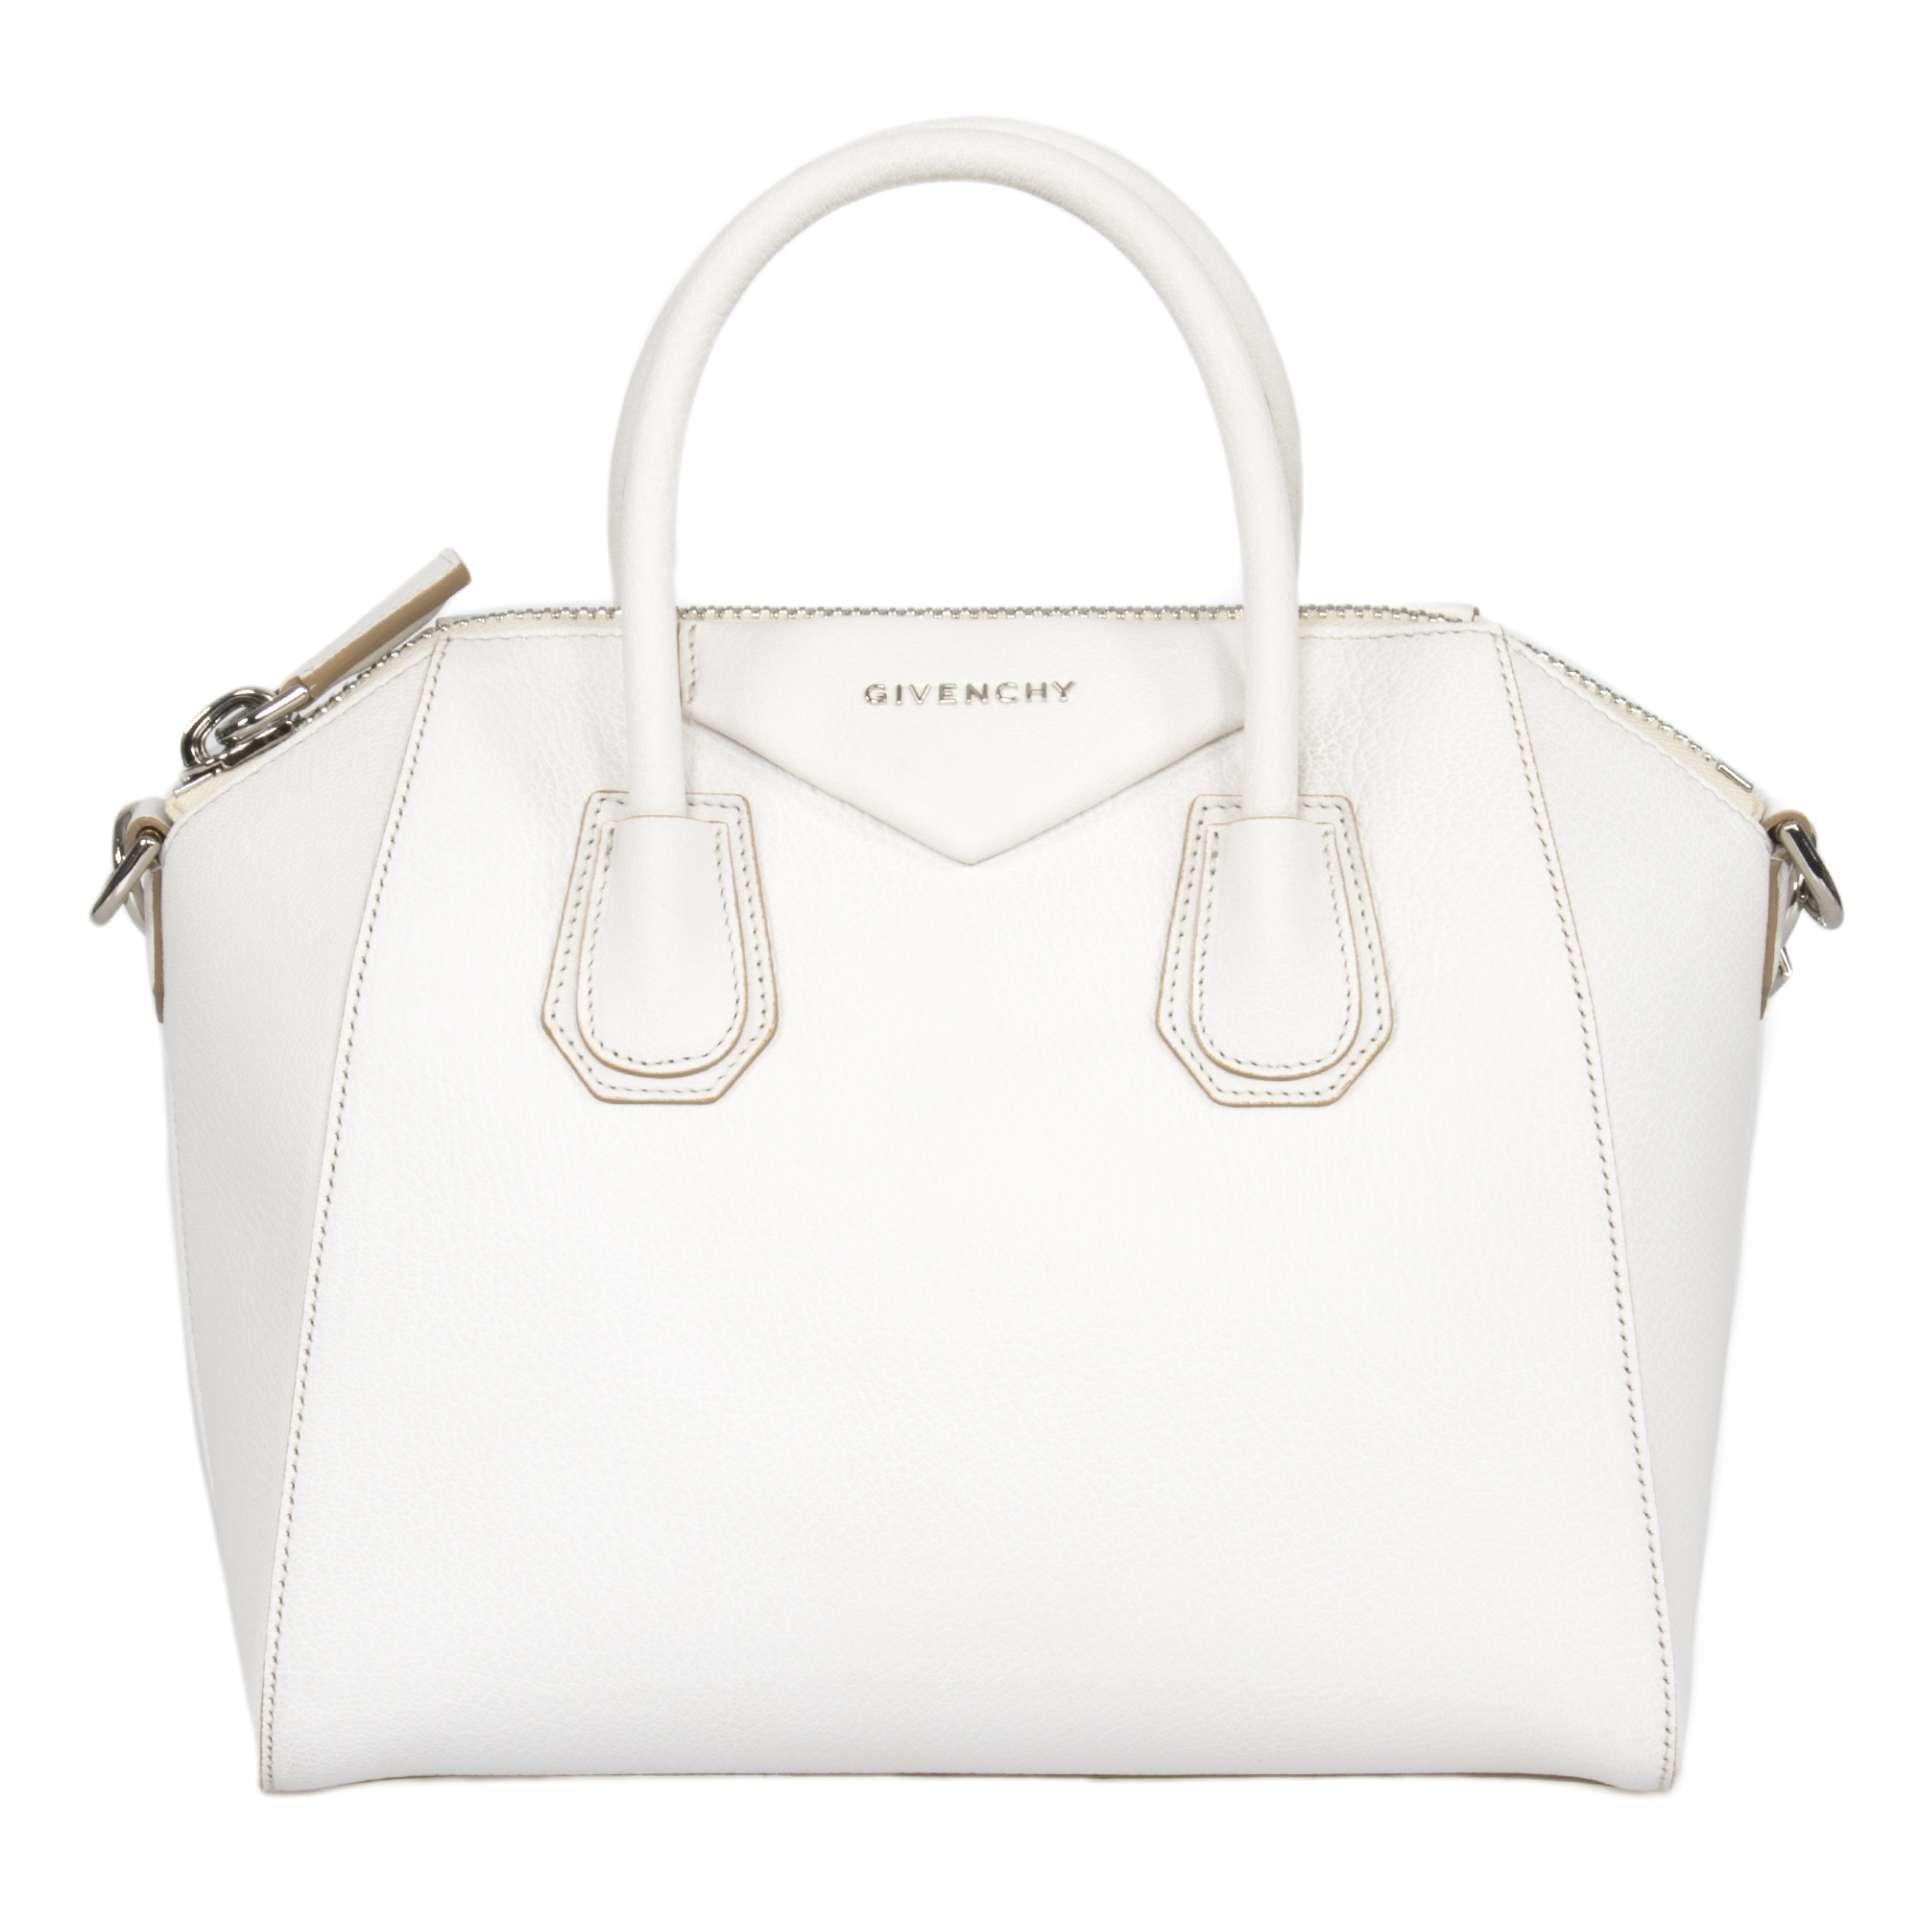 Givenchy Antigona Sugar Goatskin Satchel Bag   White & SIlver Hardware   Small